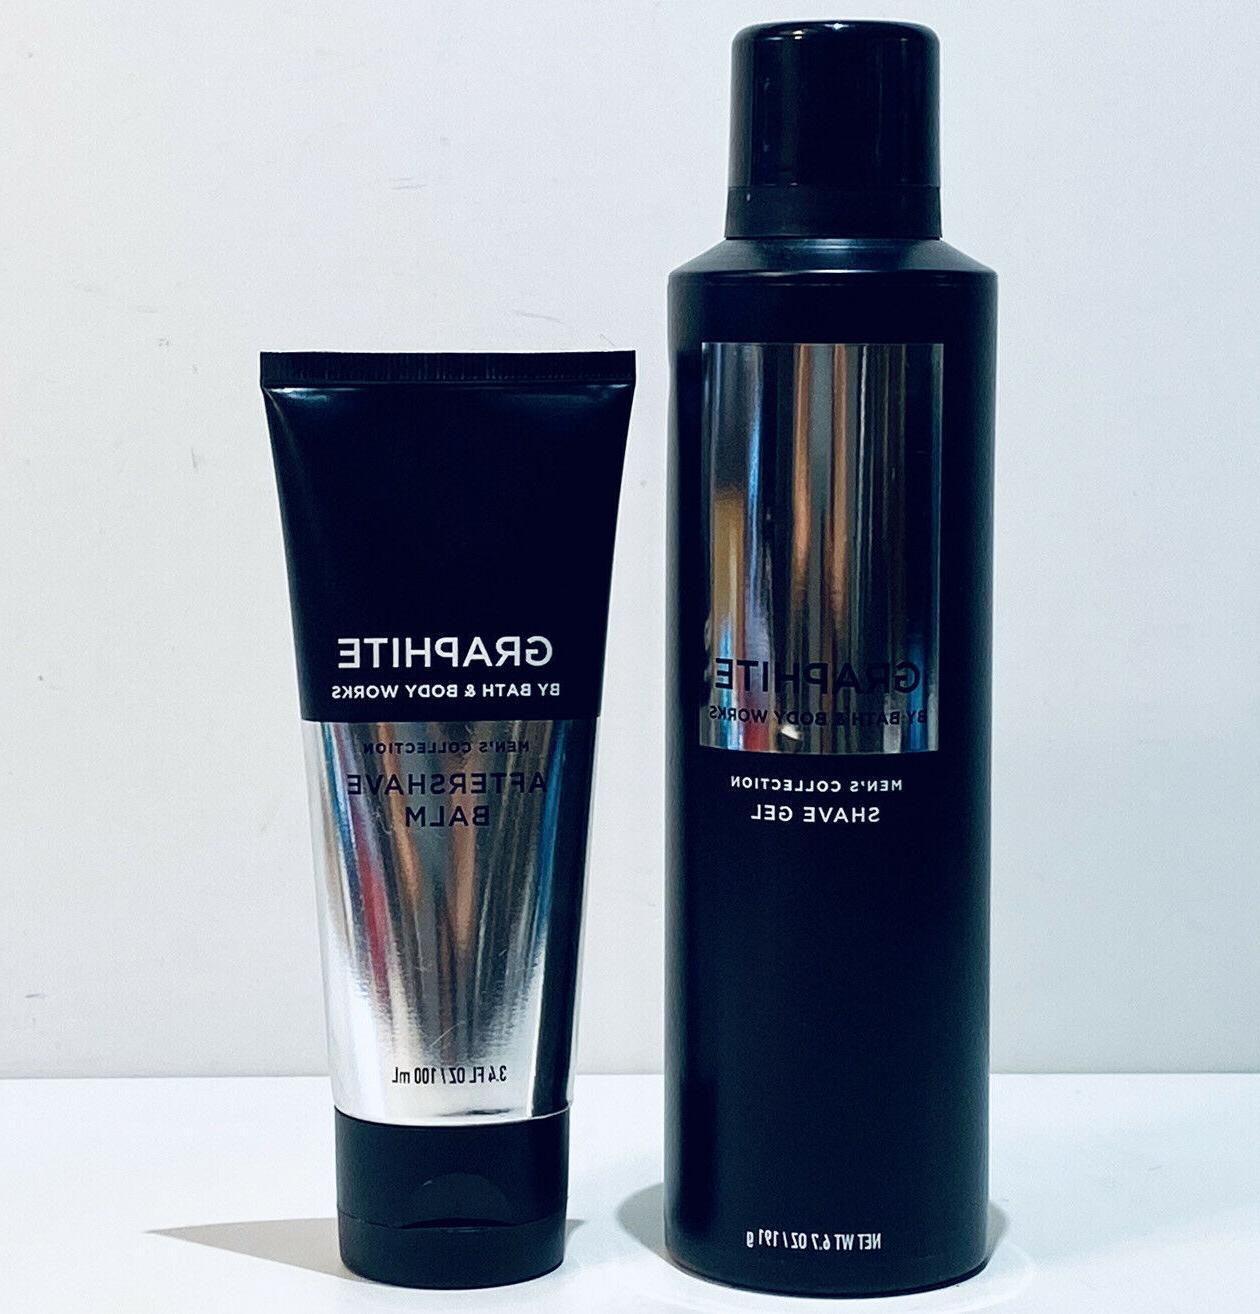 Bath & Body GRAPHITE Shaving Duo 6.7oz Shave 3.4oz